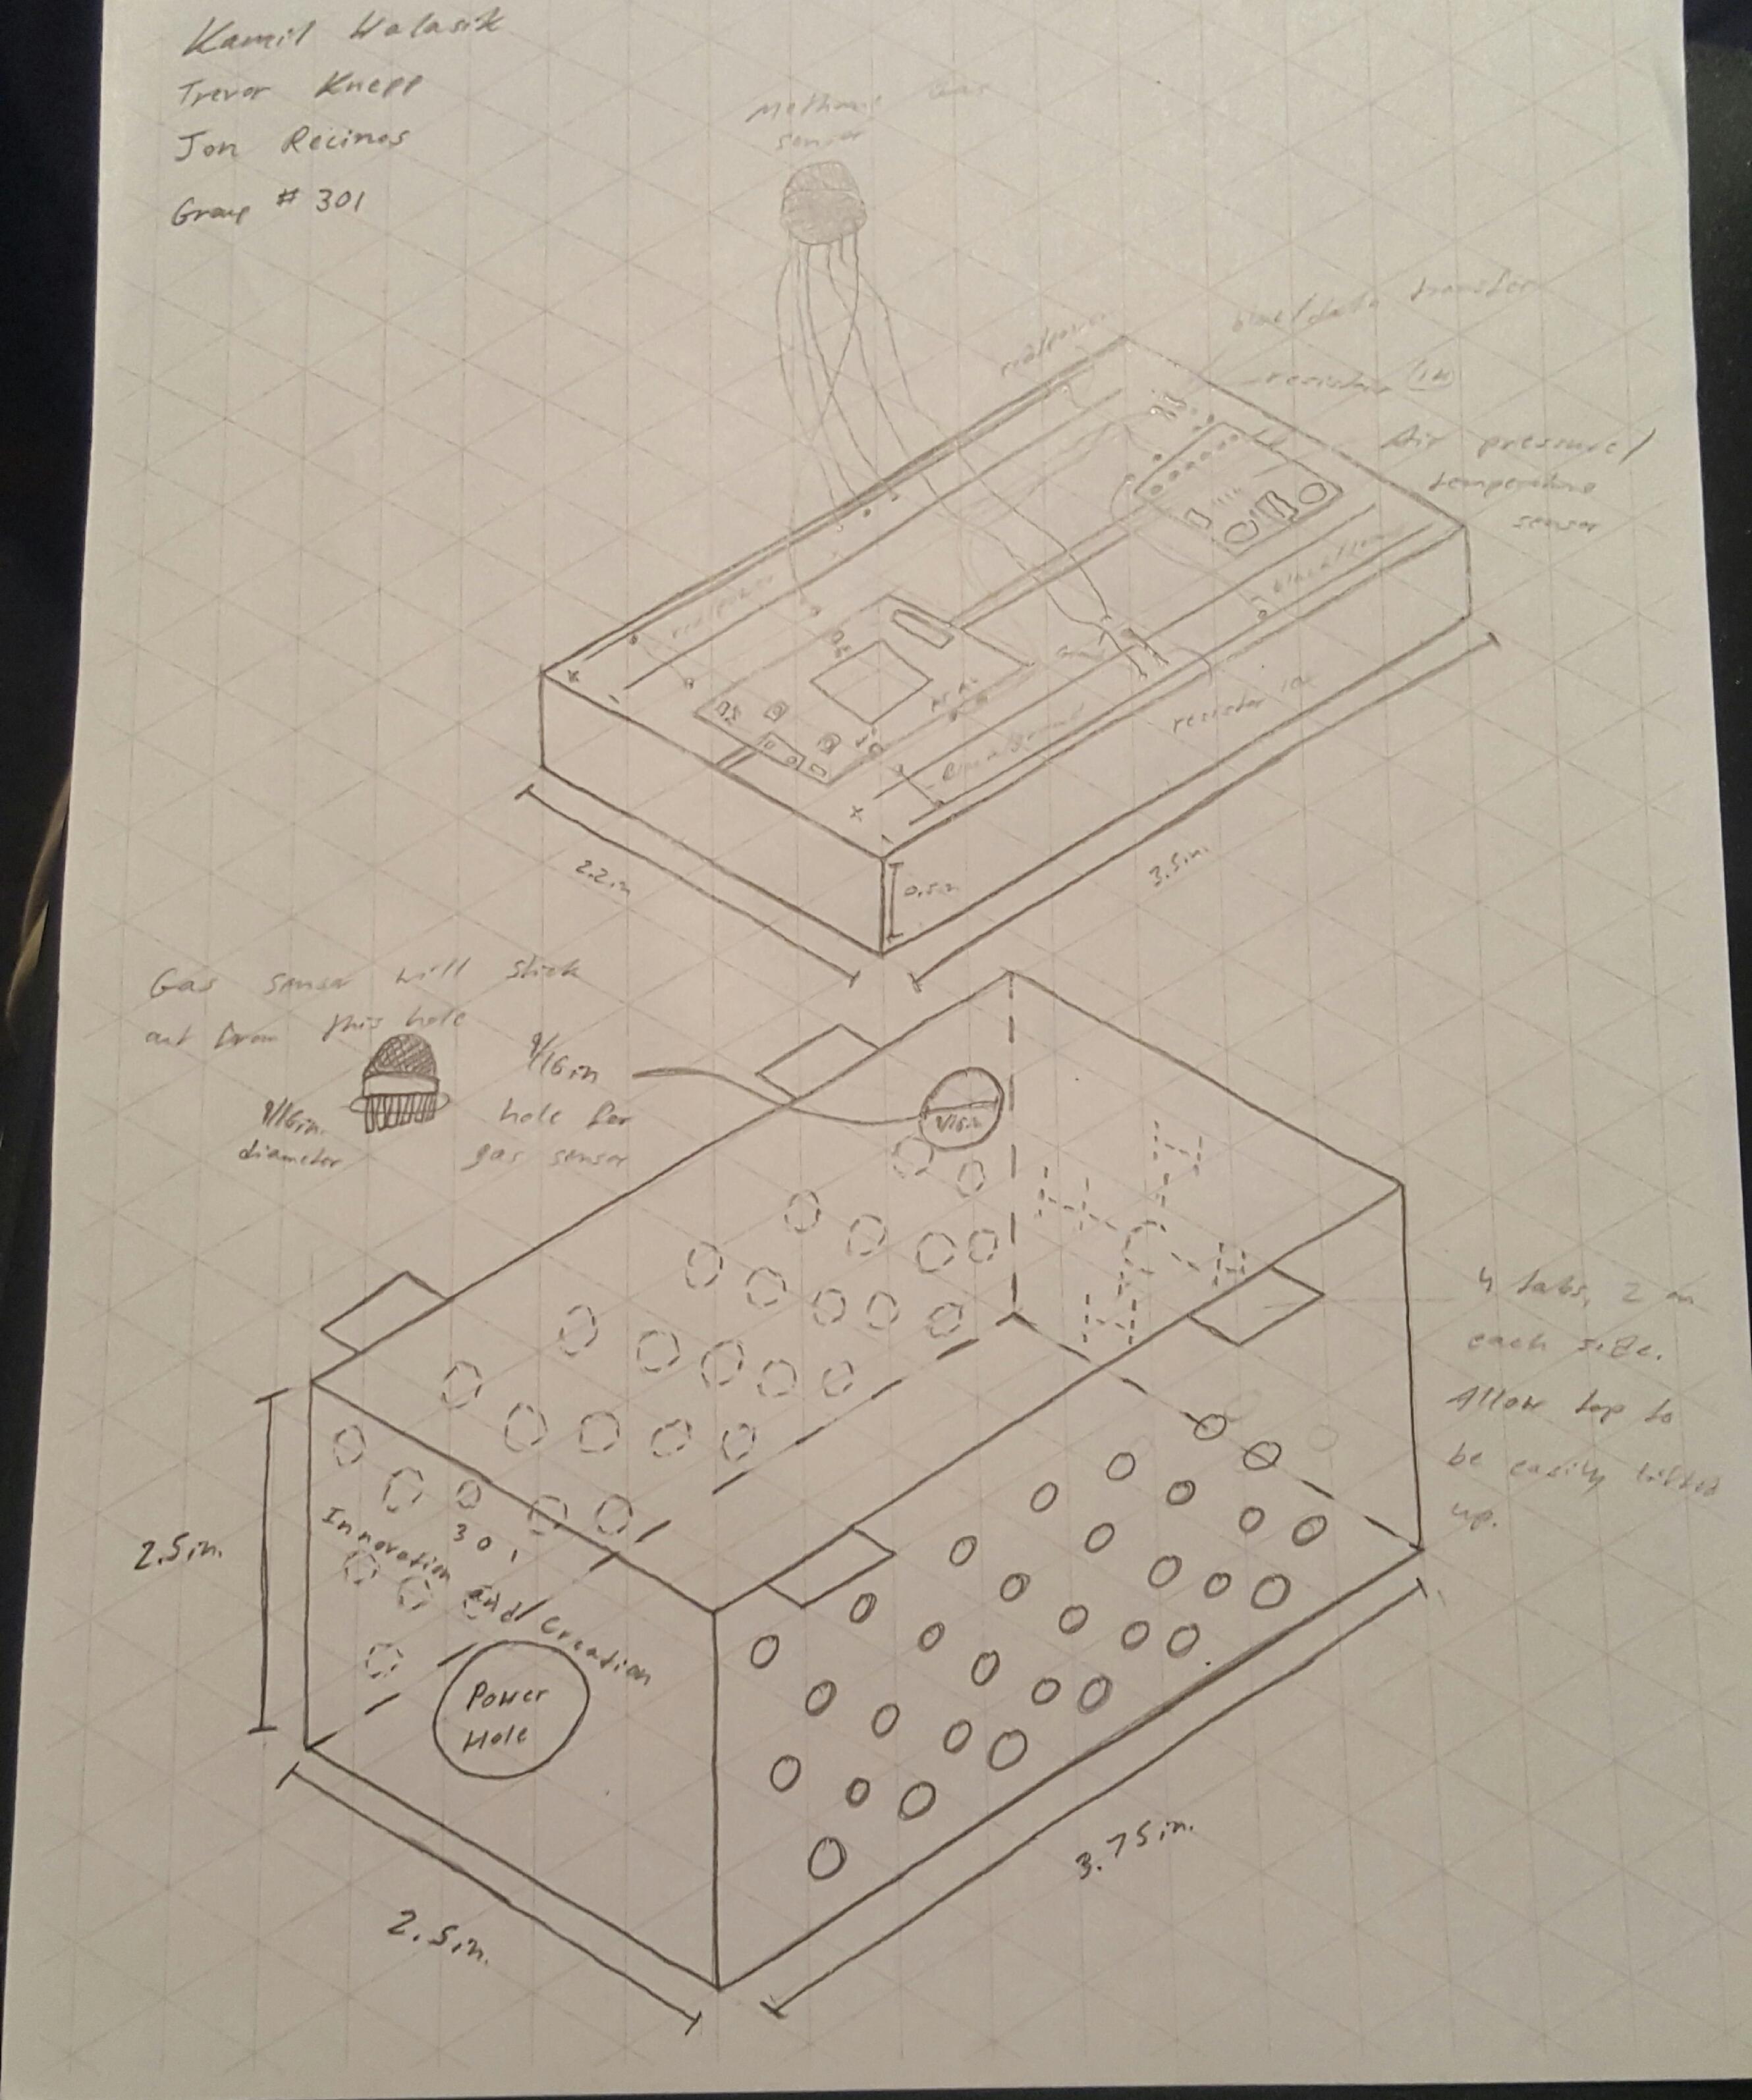 Enclosure sketch u8ikgyle4p